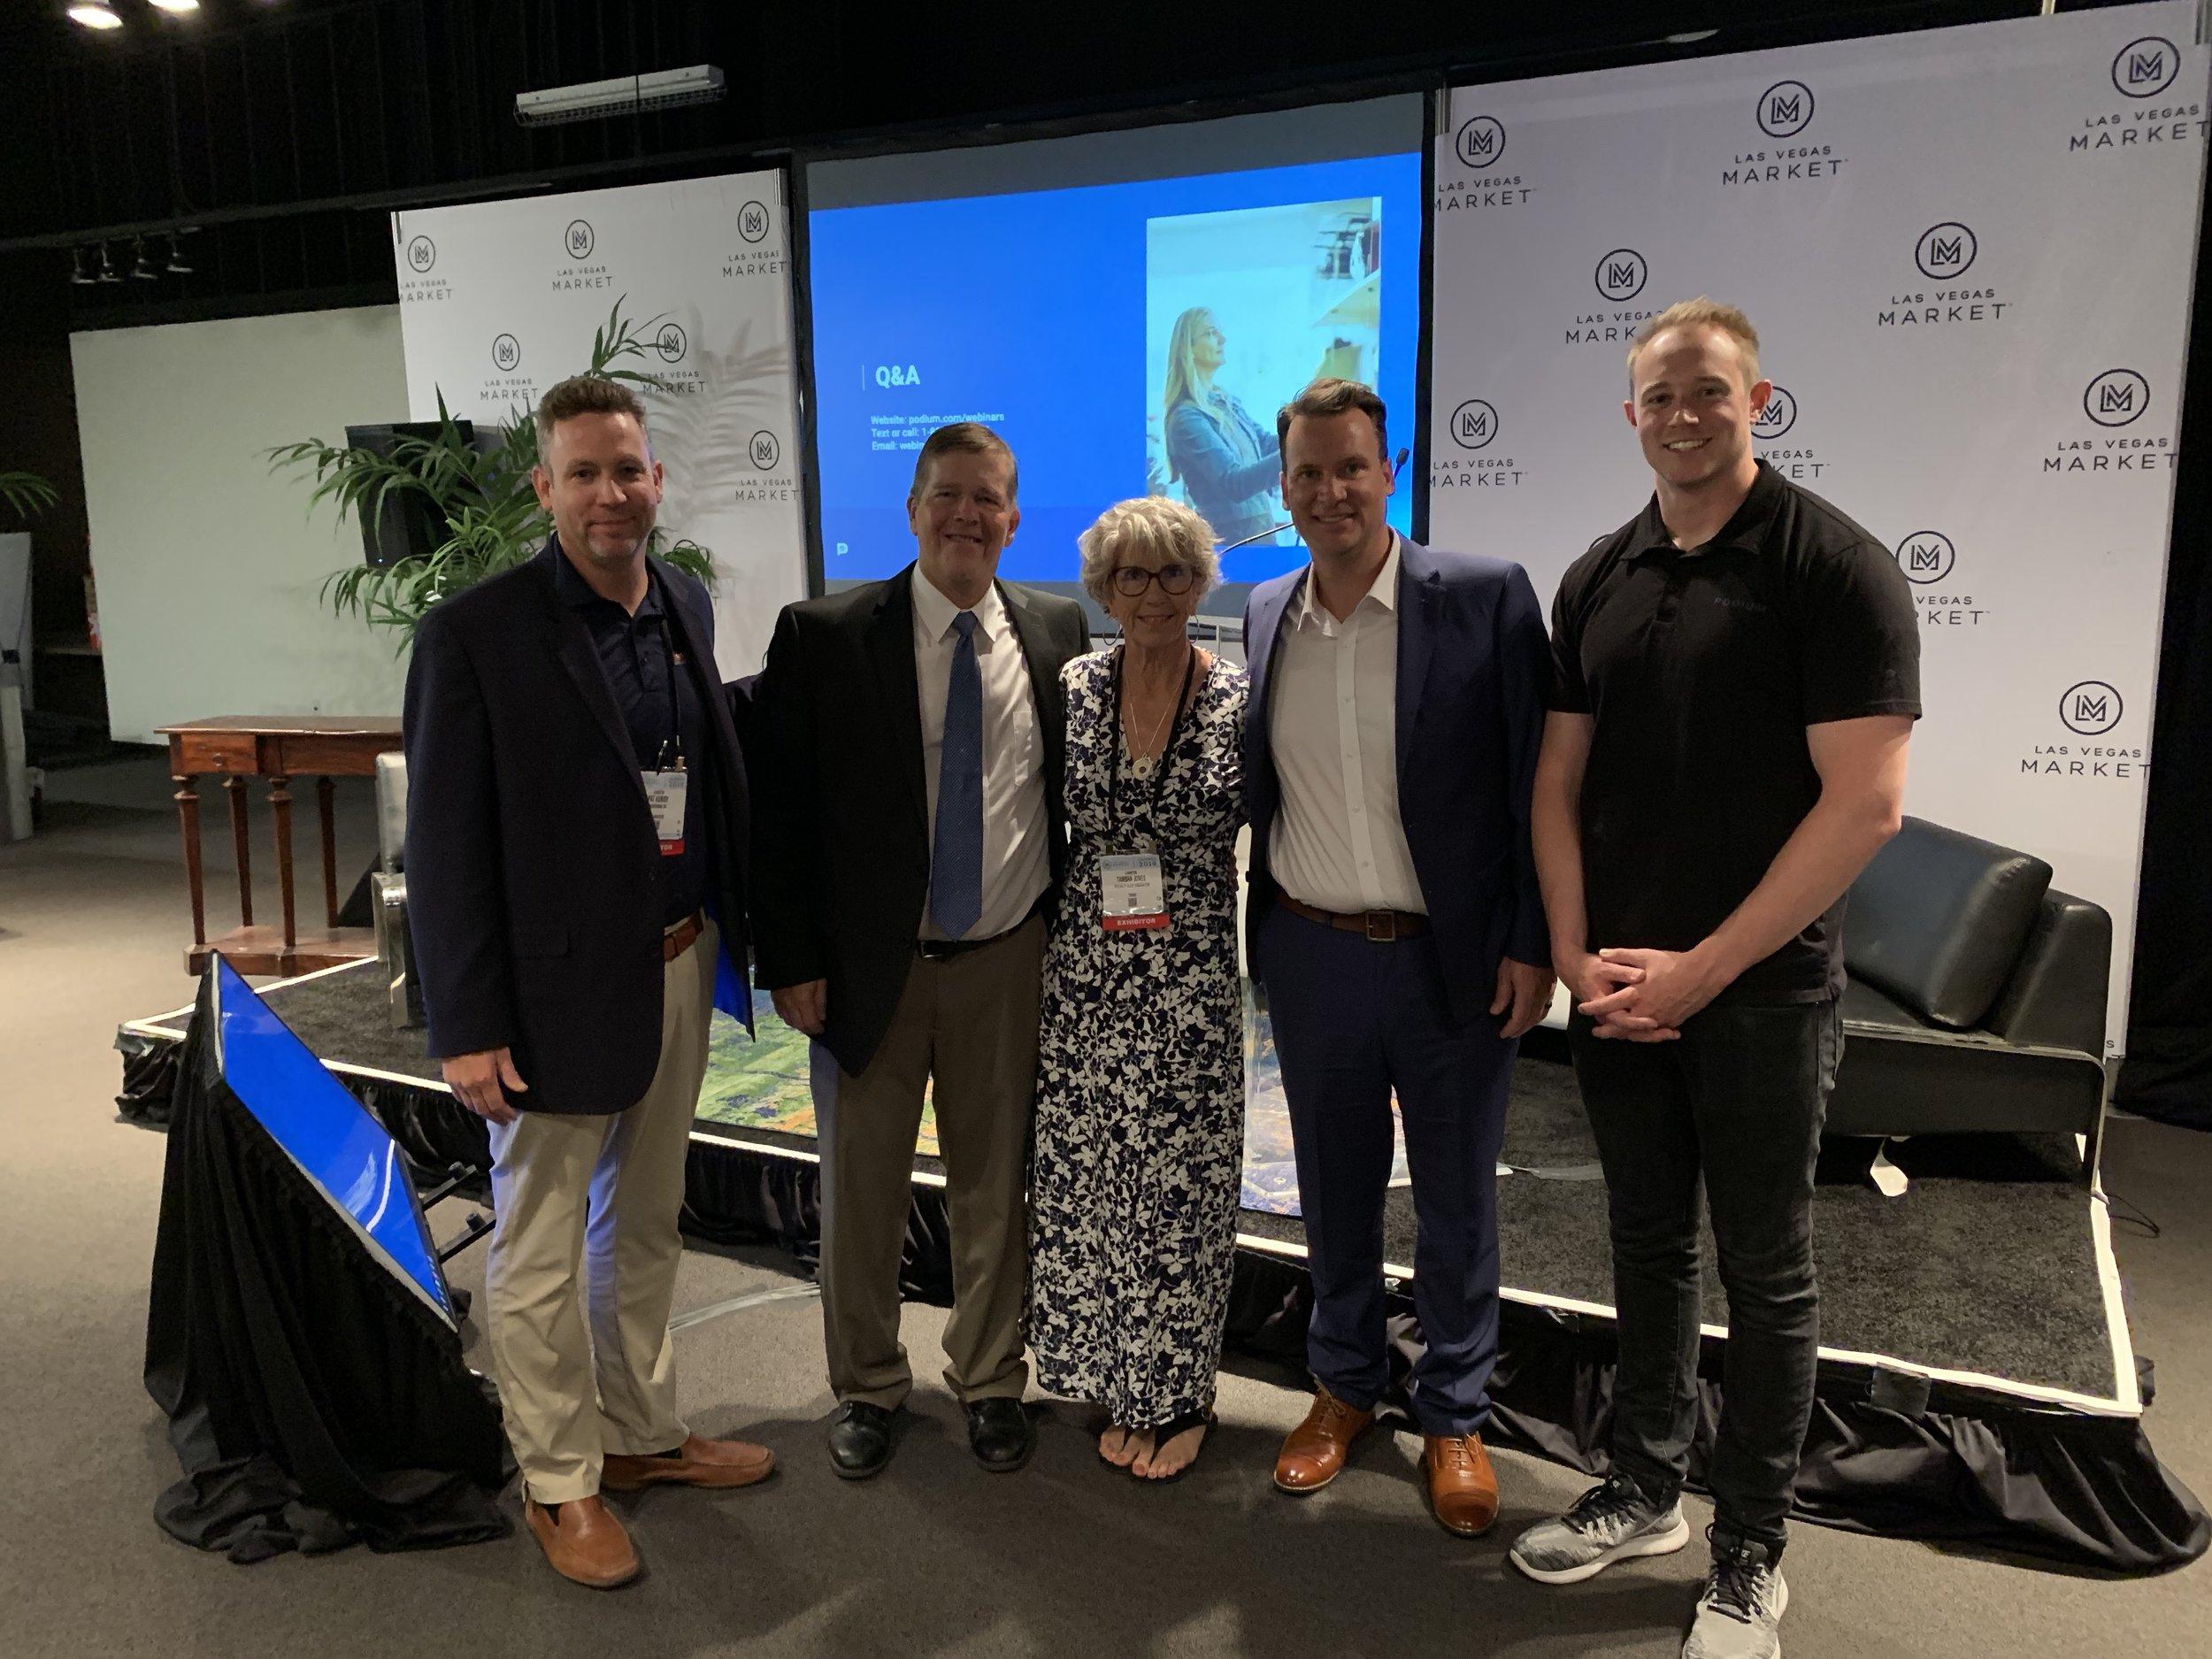 Pat Kunish - SmartWerks, Brian Davis - The Bedroom Store and SSA Board Member, Tambra Jones - SSA Executive Director, Shawn Doane - Speaker/SmartWerks and Ty Bate - Speaker/Podium